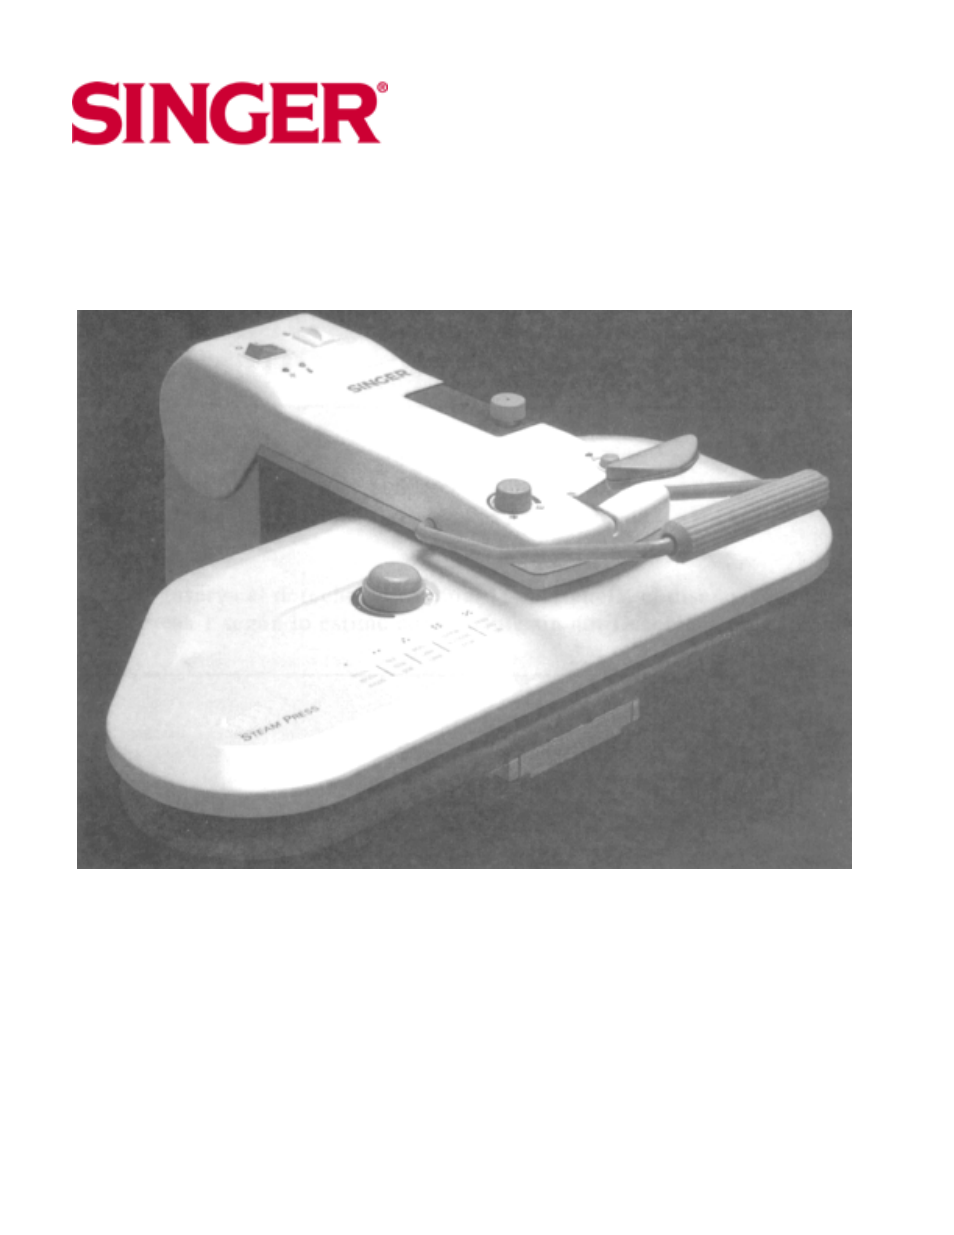 singer magic steam press csp 1 instruction manual